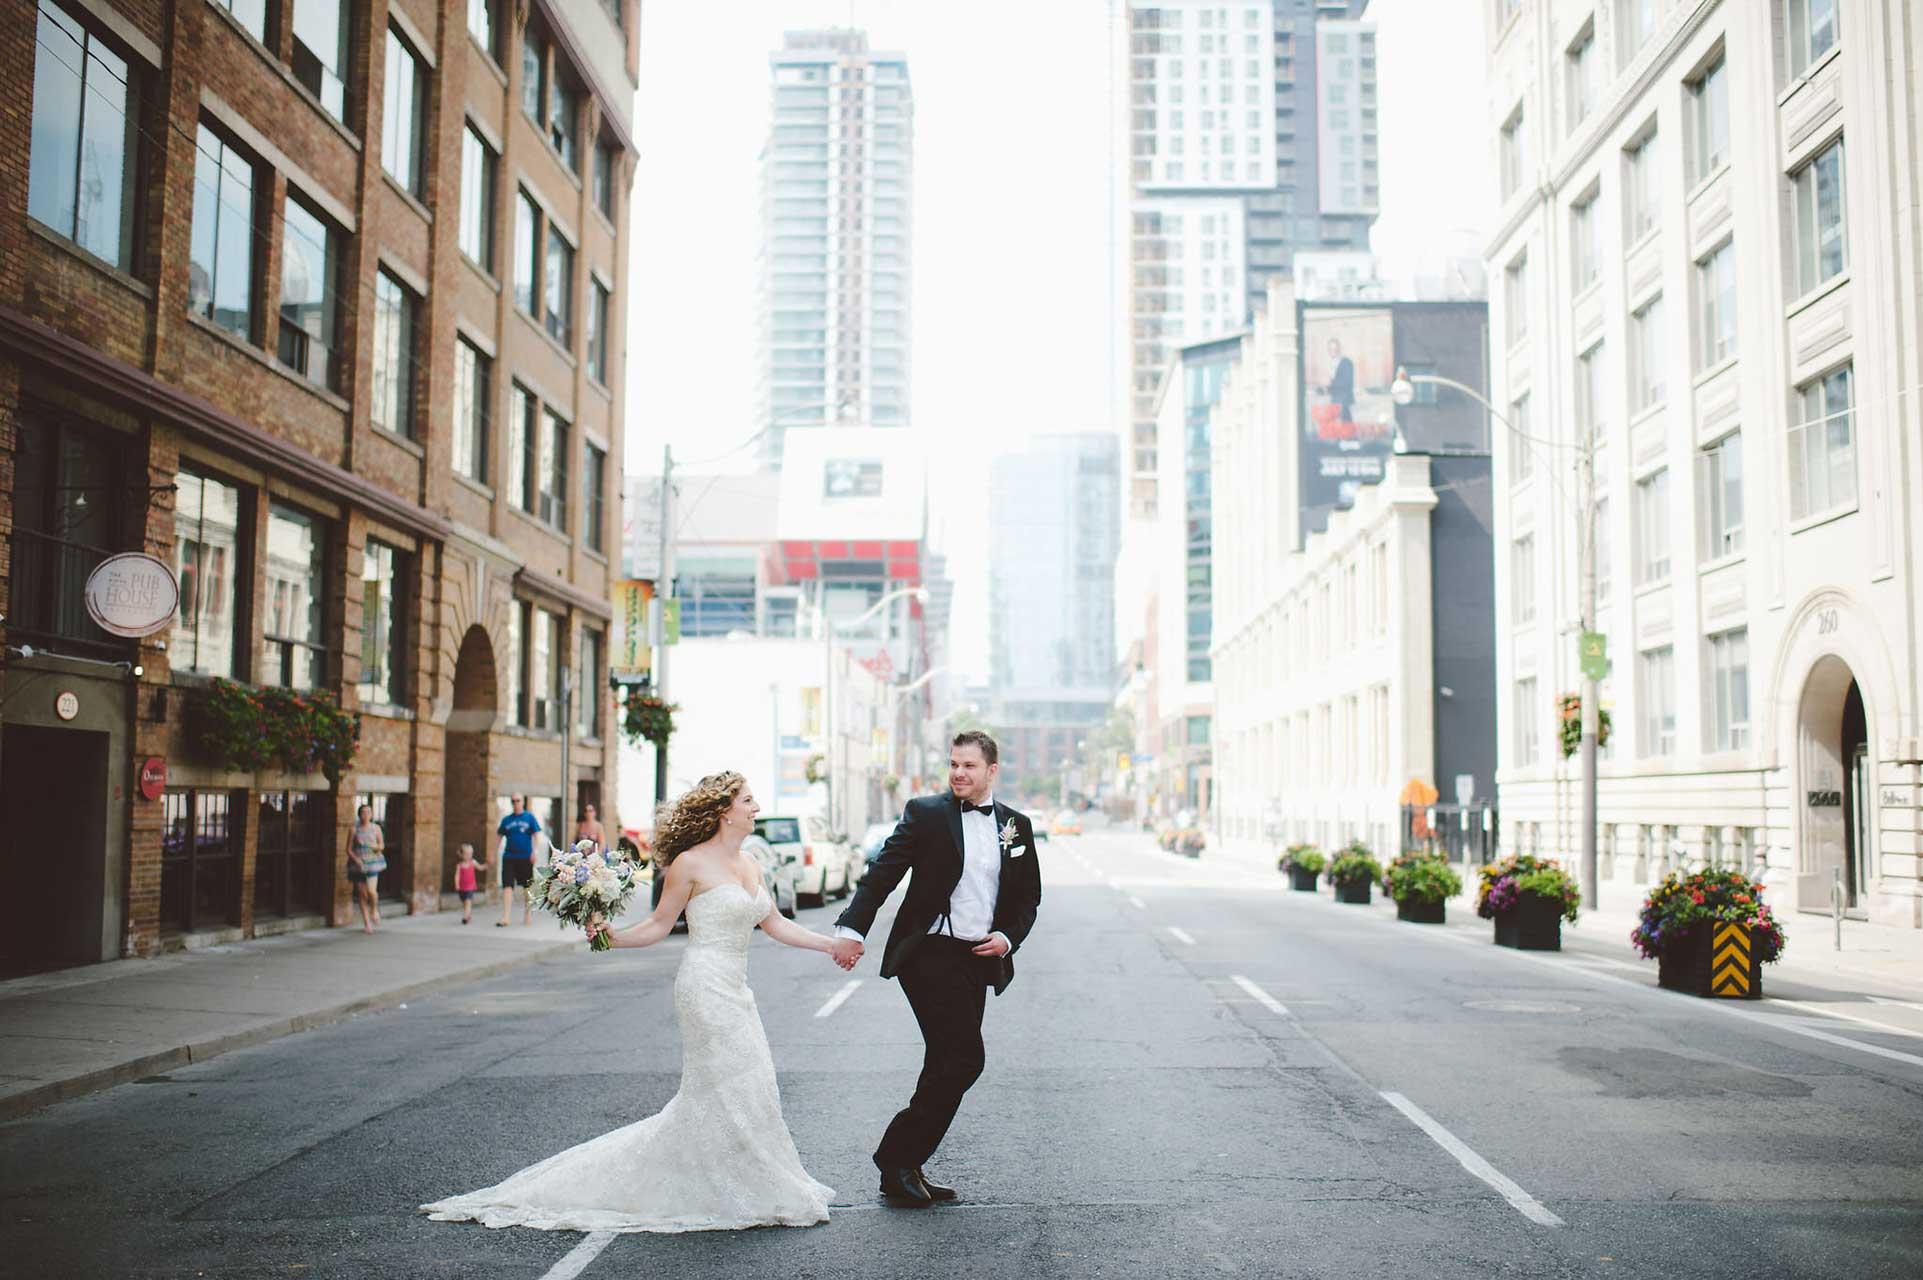 Wedding Venues Toronto - Wedding Photography - Toronto Entertainment District